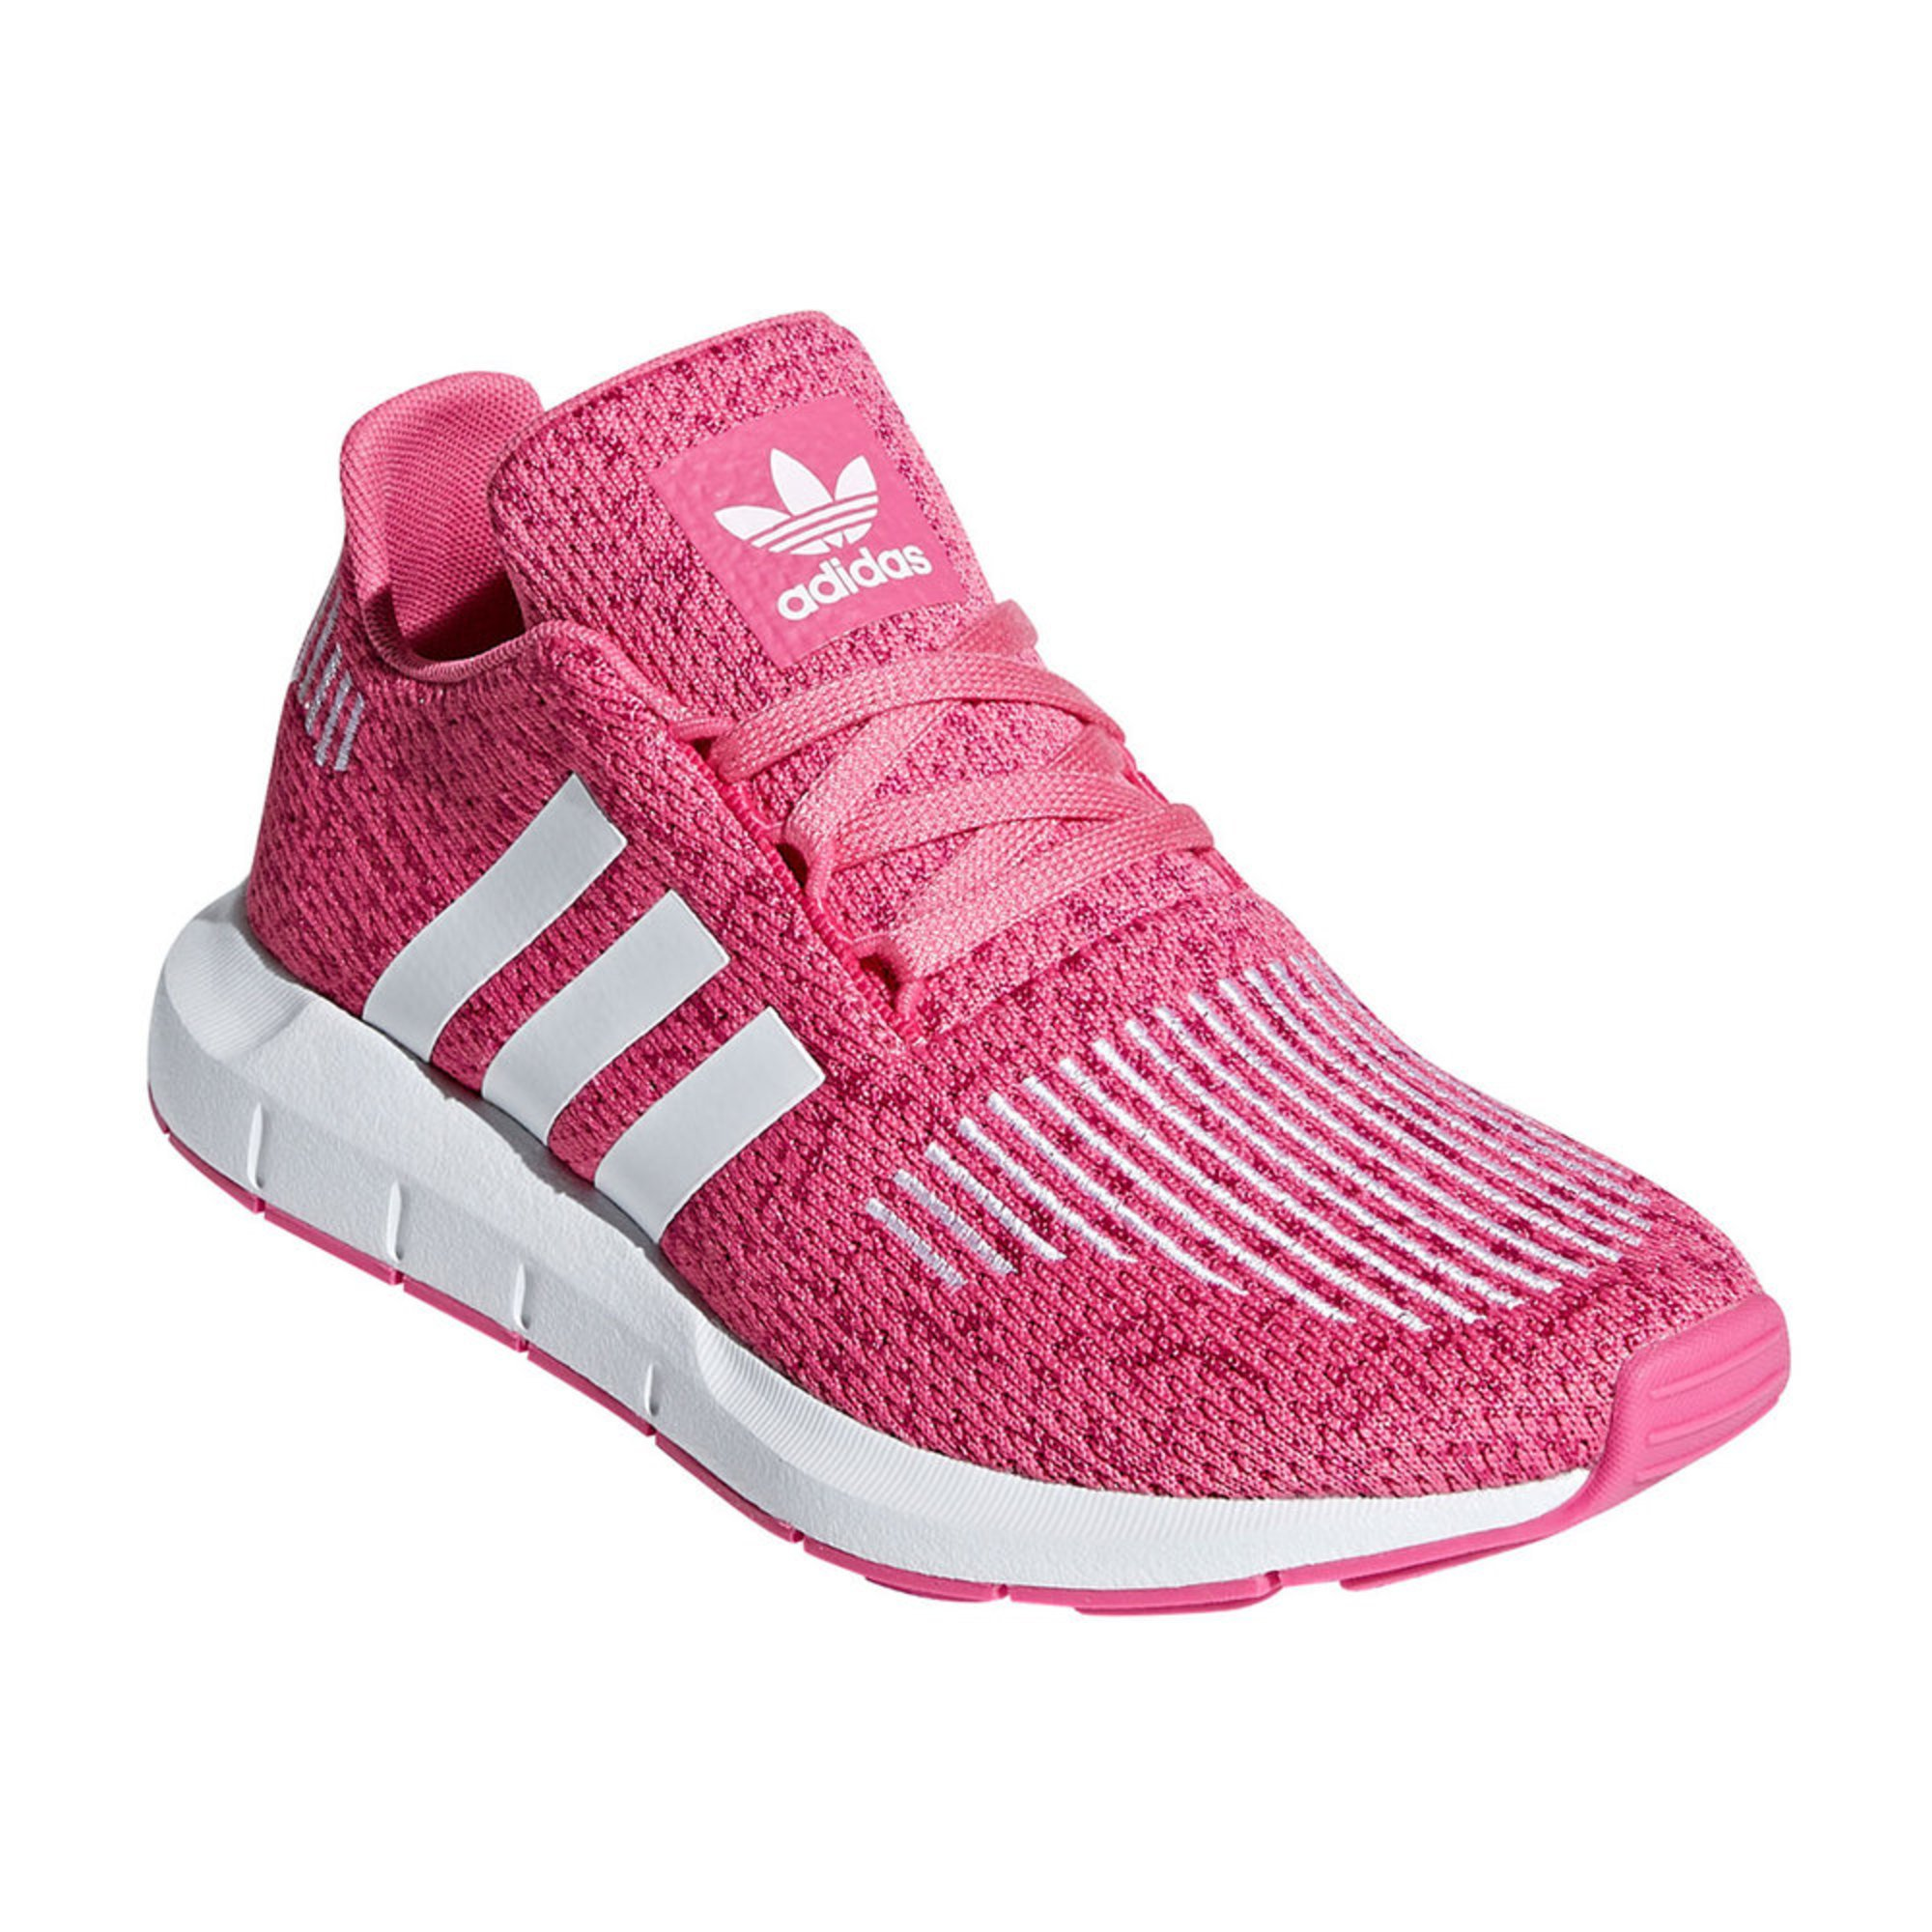 3356bf1f4eb3e Adidas Girls Swift Run C Running Shoe (youth)